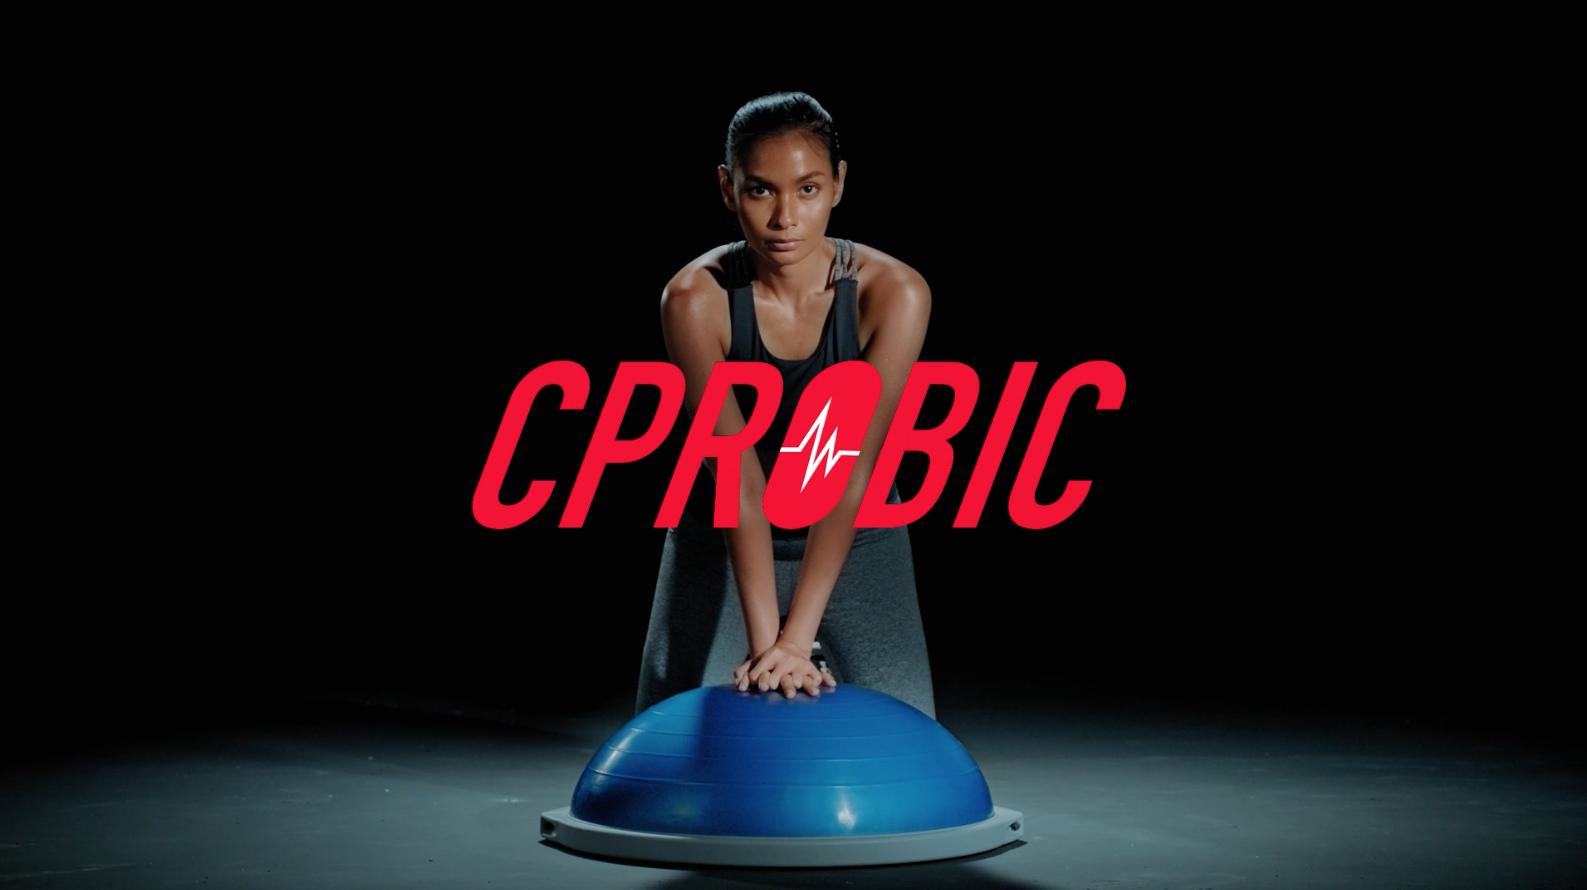 CPROBIC ท่าออกกำลังกายแบบใหม่ผสมท่า CPR เซฟหุ่น – เซฟชีวิต